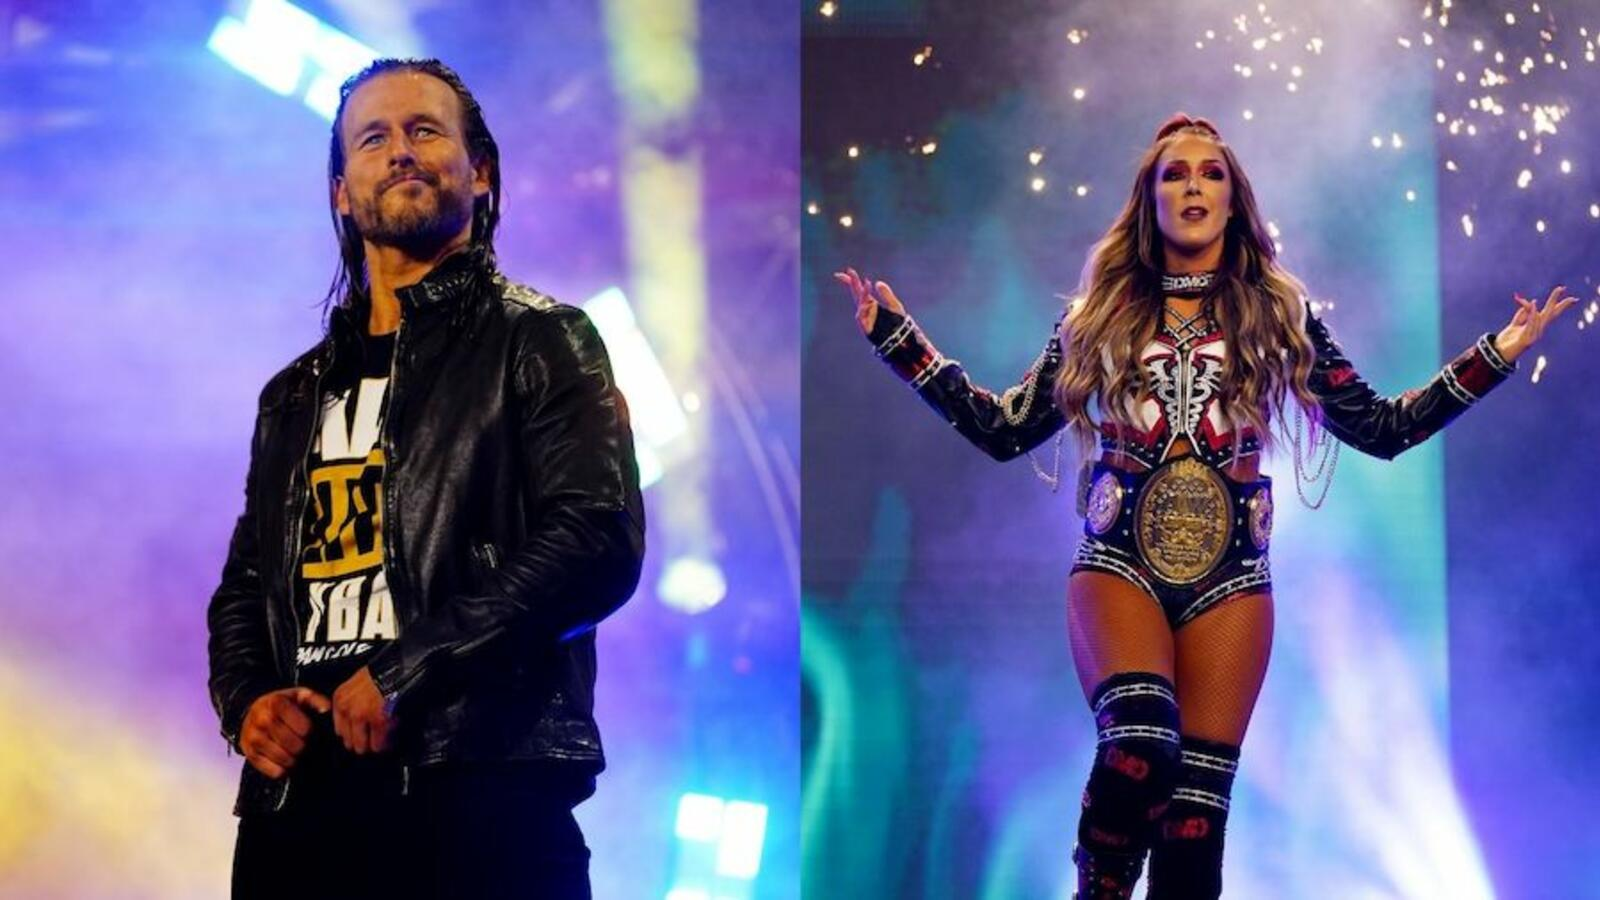 Adam Cole Details NXT's Interest In Signing Girlfriend Britt Baker